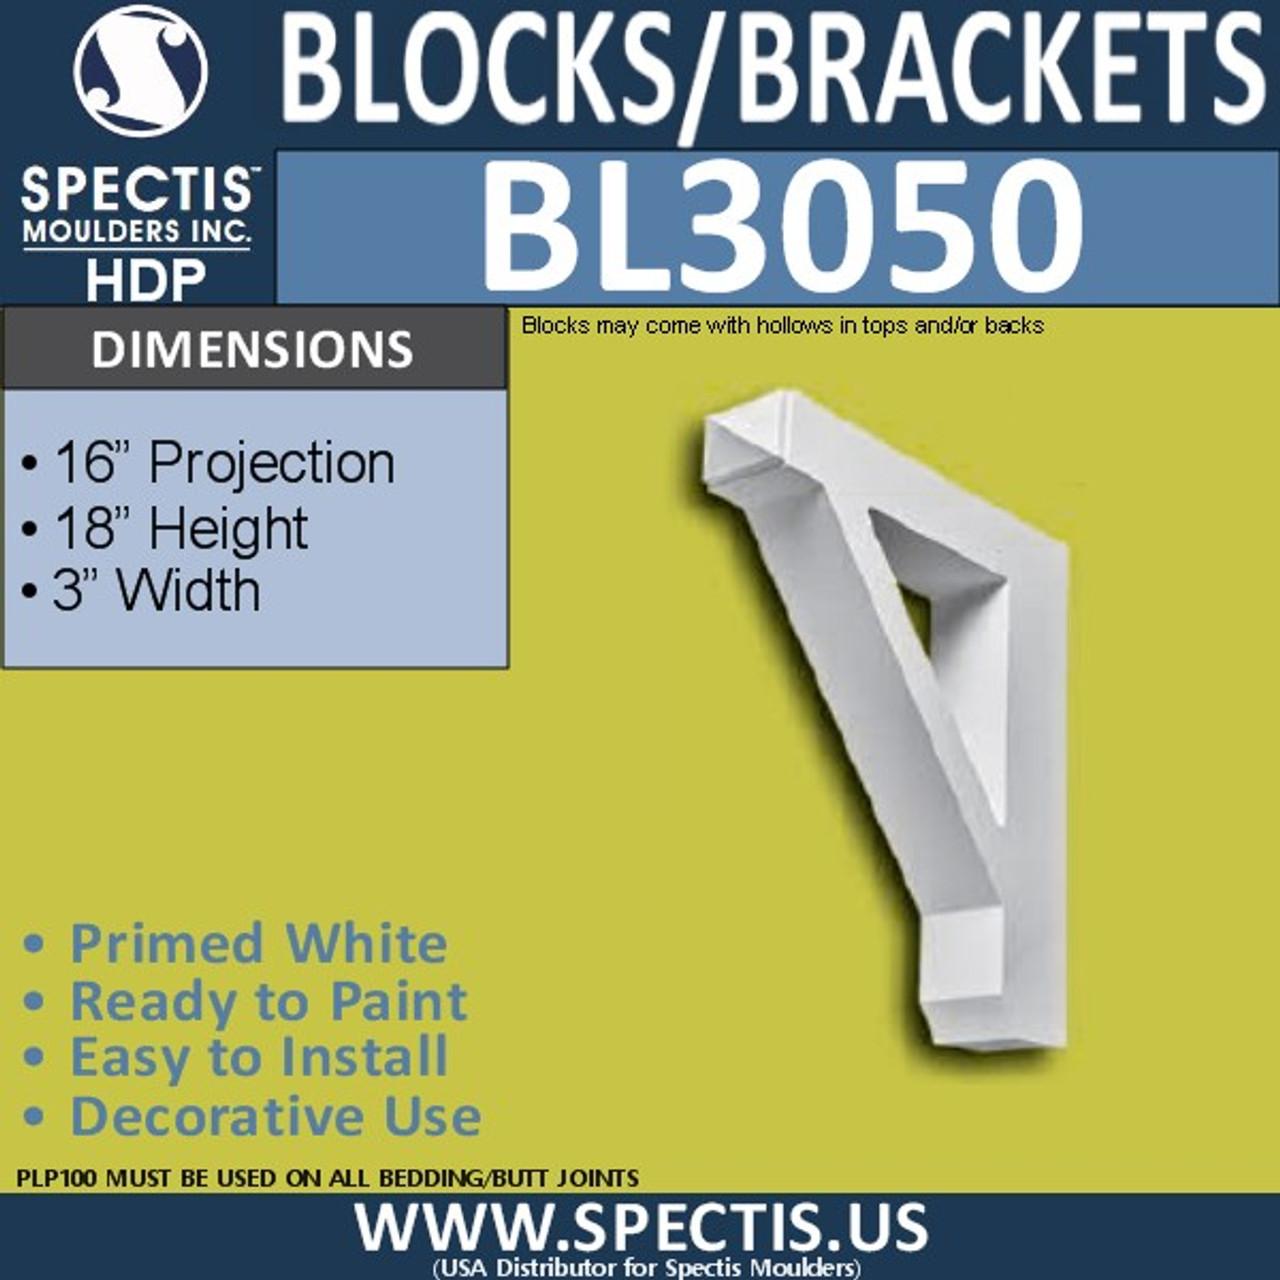 "BL3050 Eave Block or Bracket 3""W x 18""H x 16"" P"